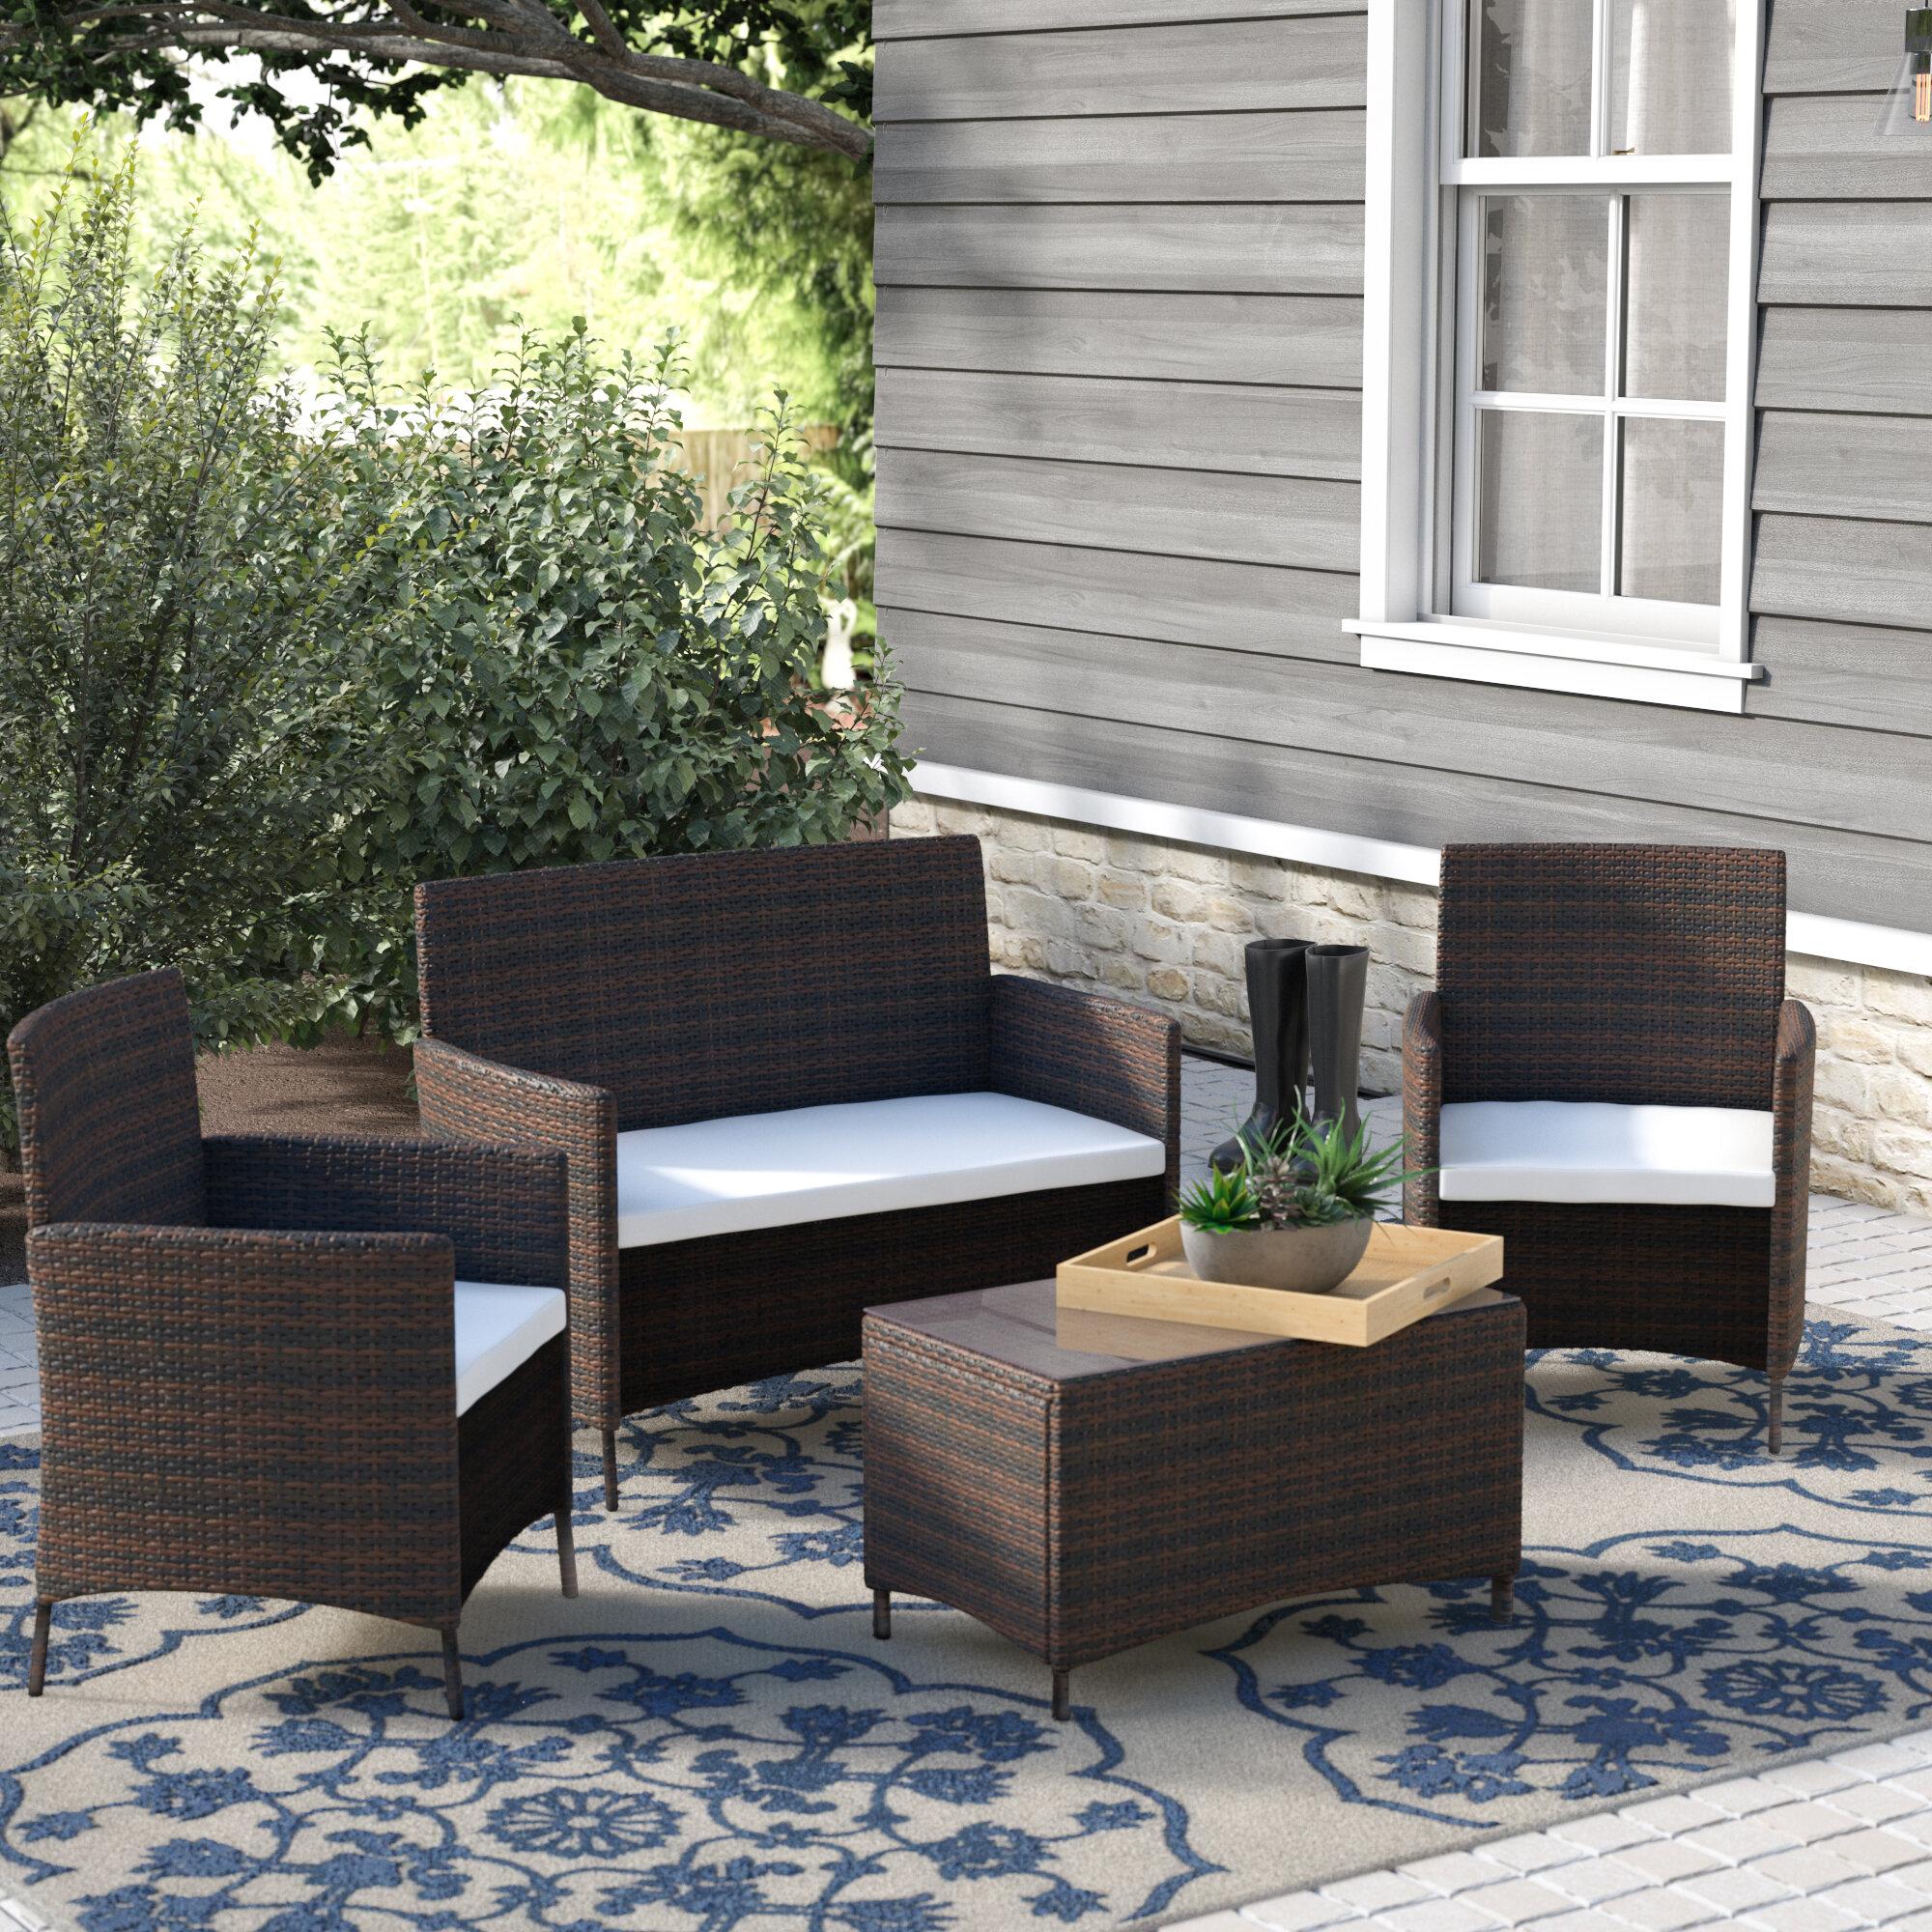 Merax 4 Piece Rattan Sofa Seating Group With Cushions Reviews Wayfair